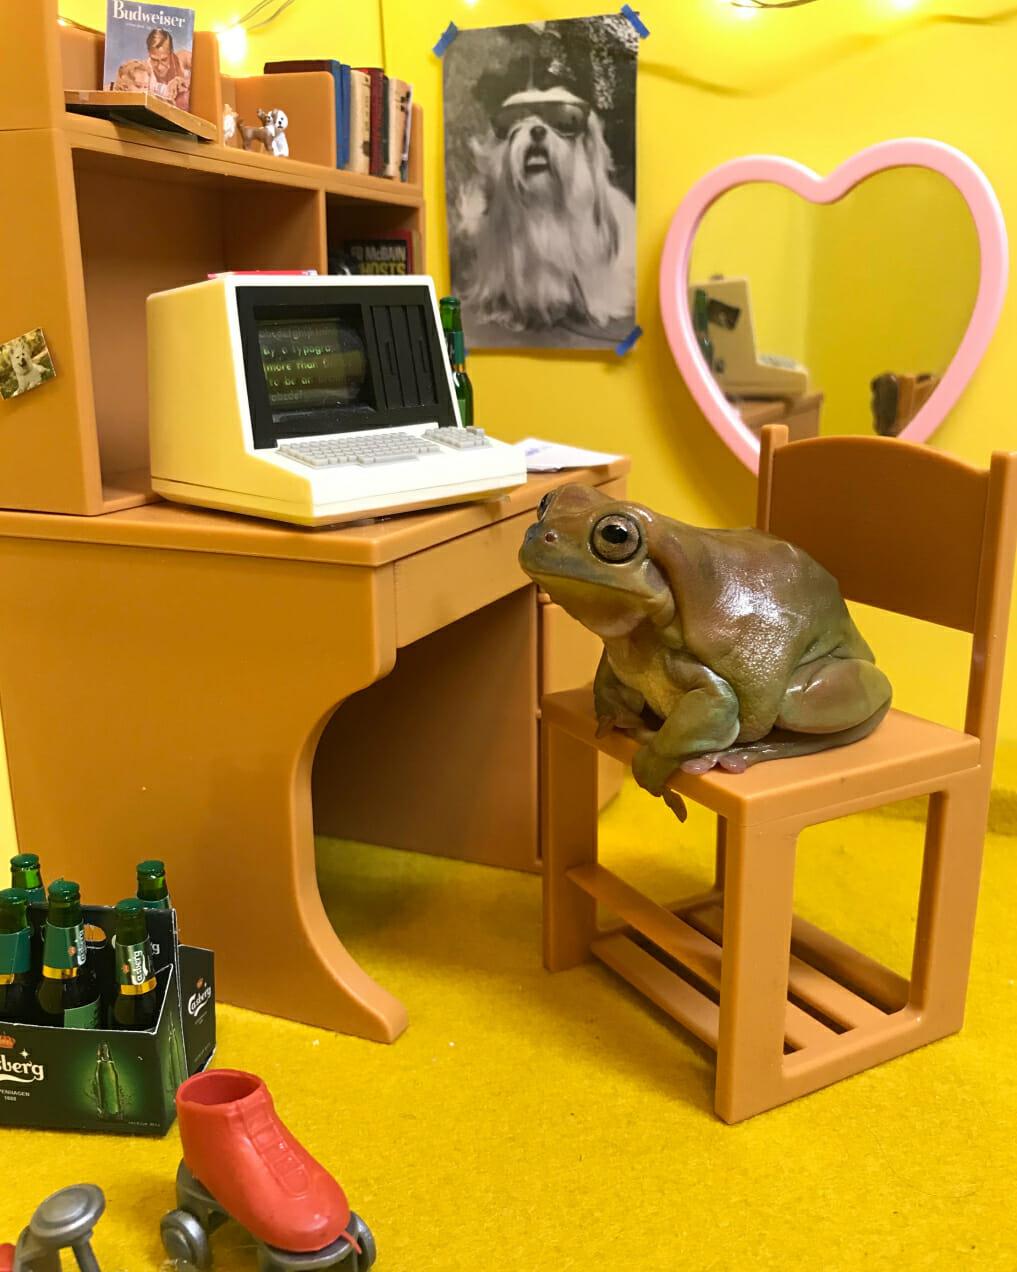 aleia murawksi instagram frog man repeller